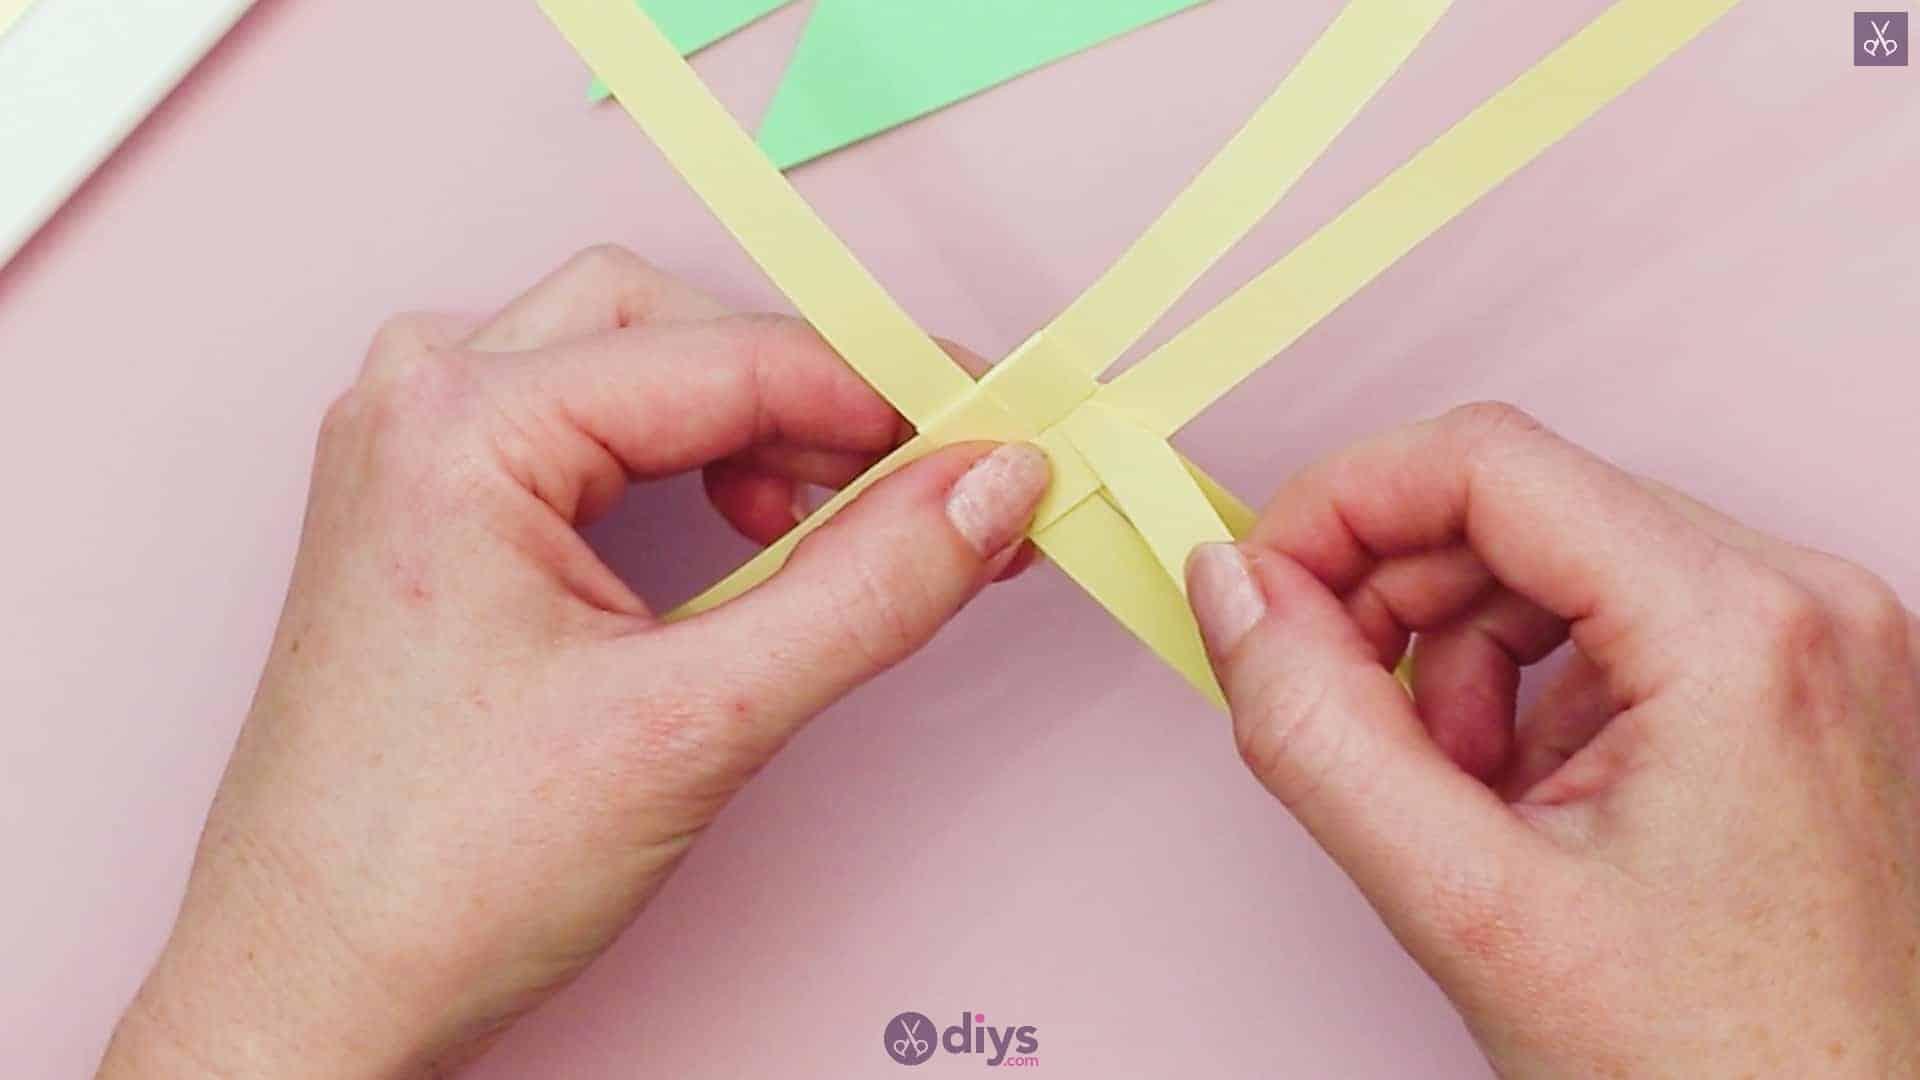 Diy origami flower art step 4a